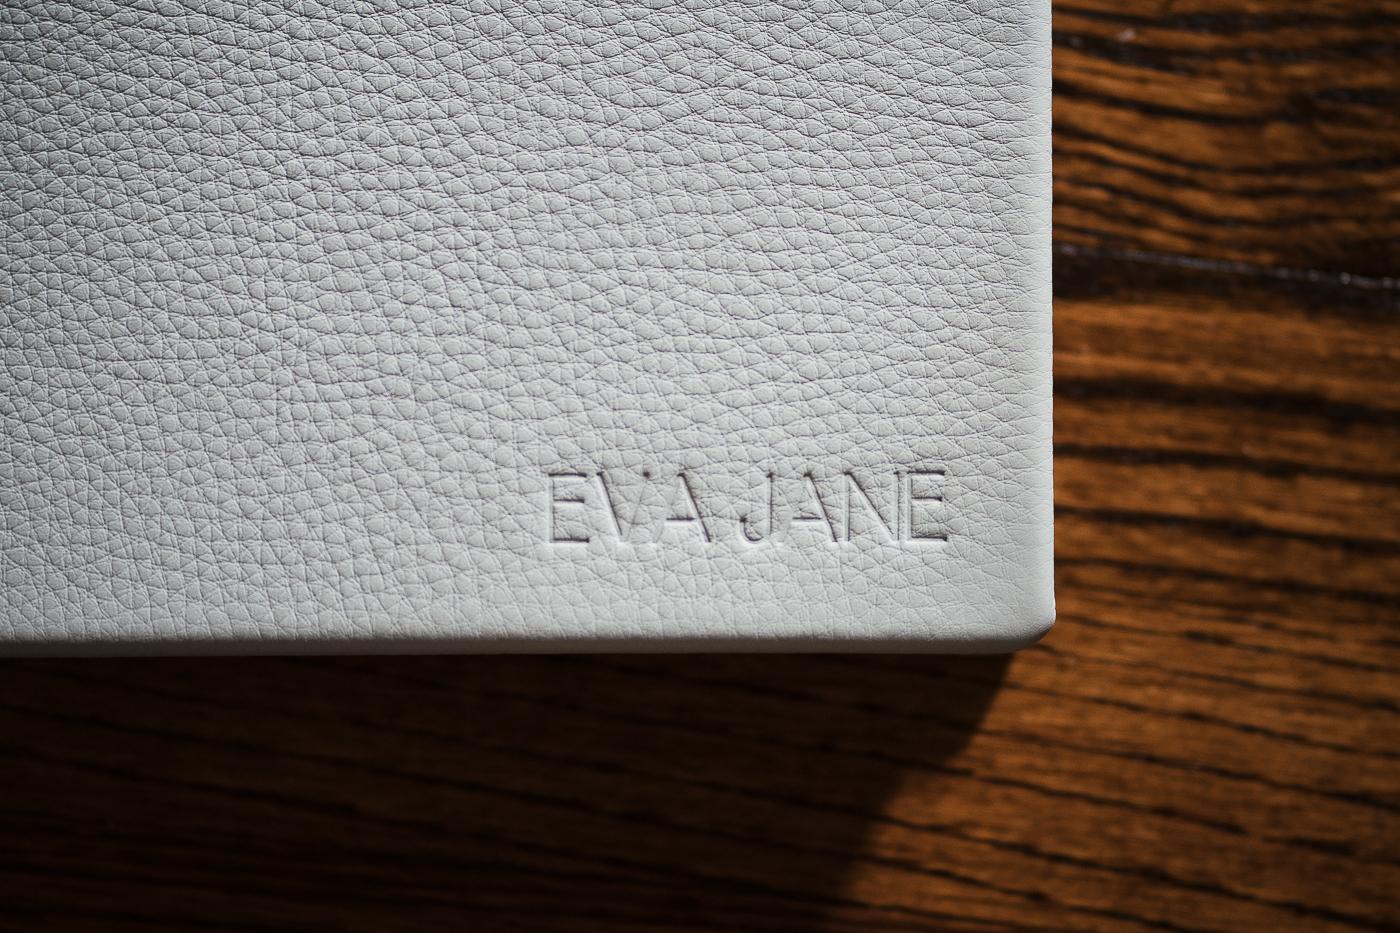 Eva Jane Album-1.JPG